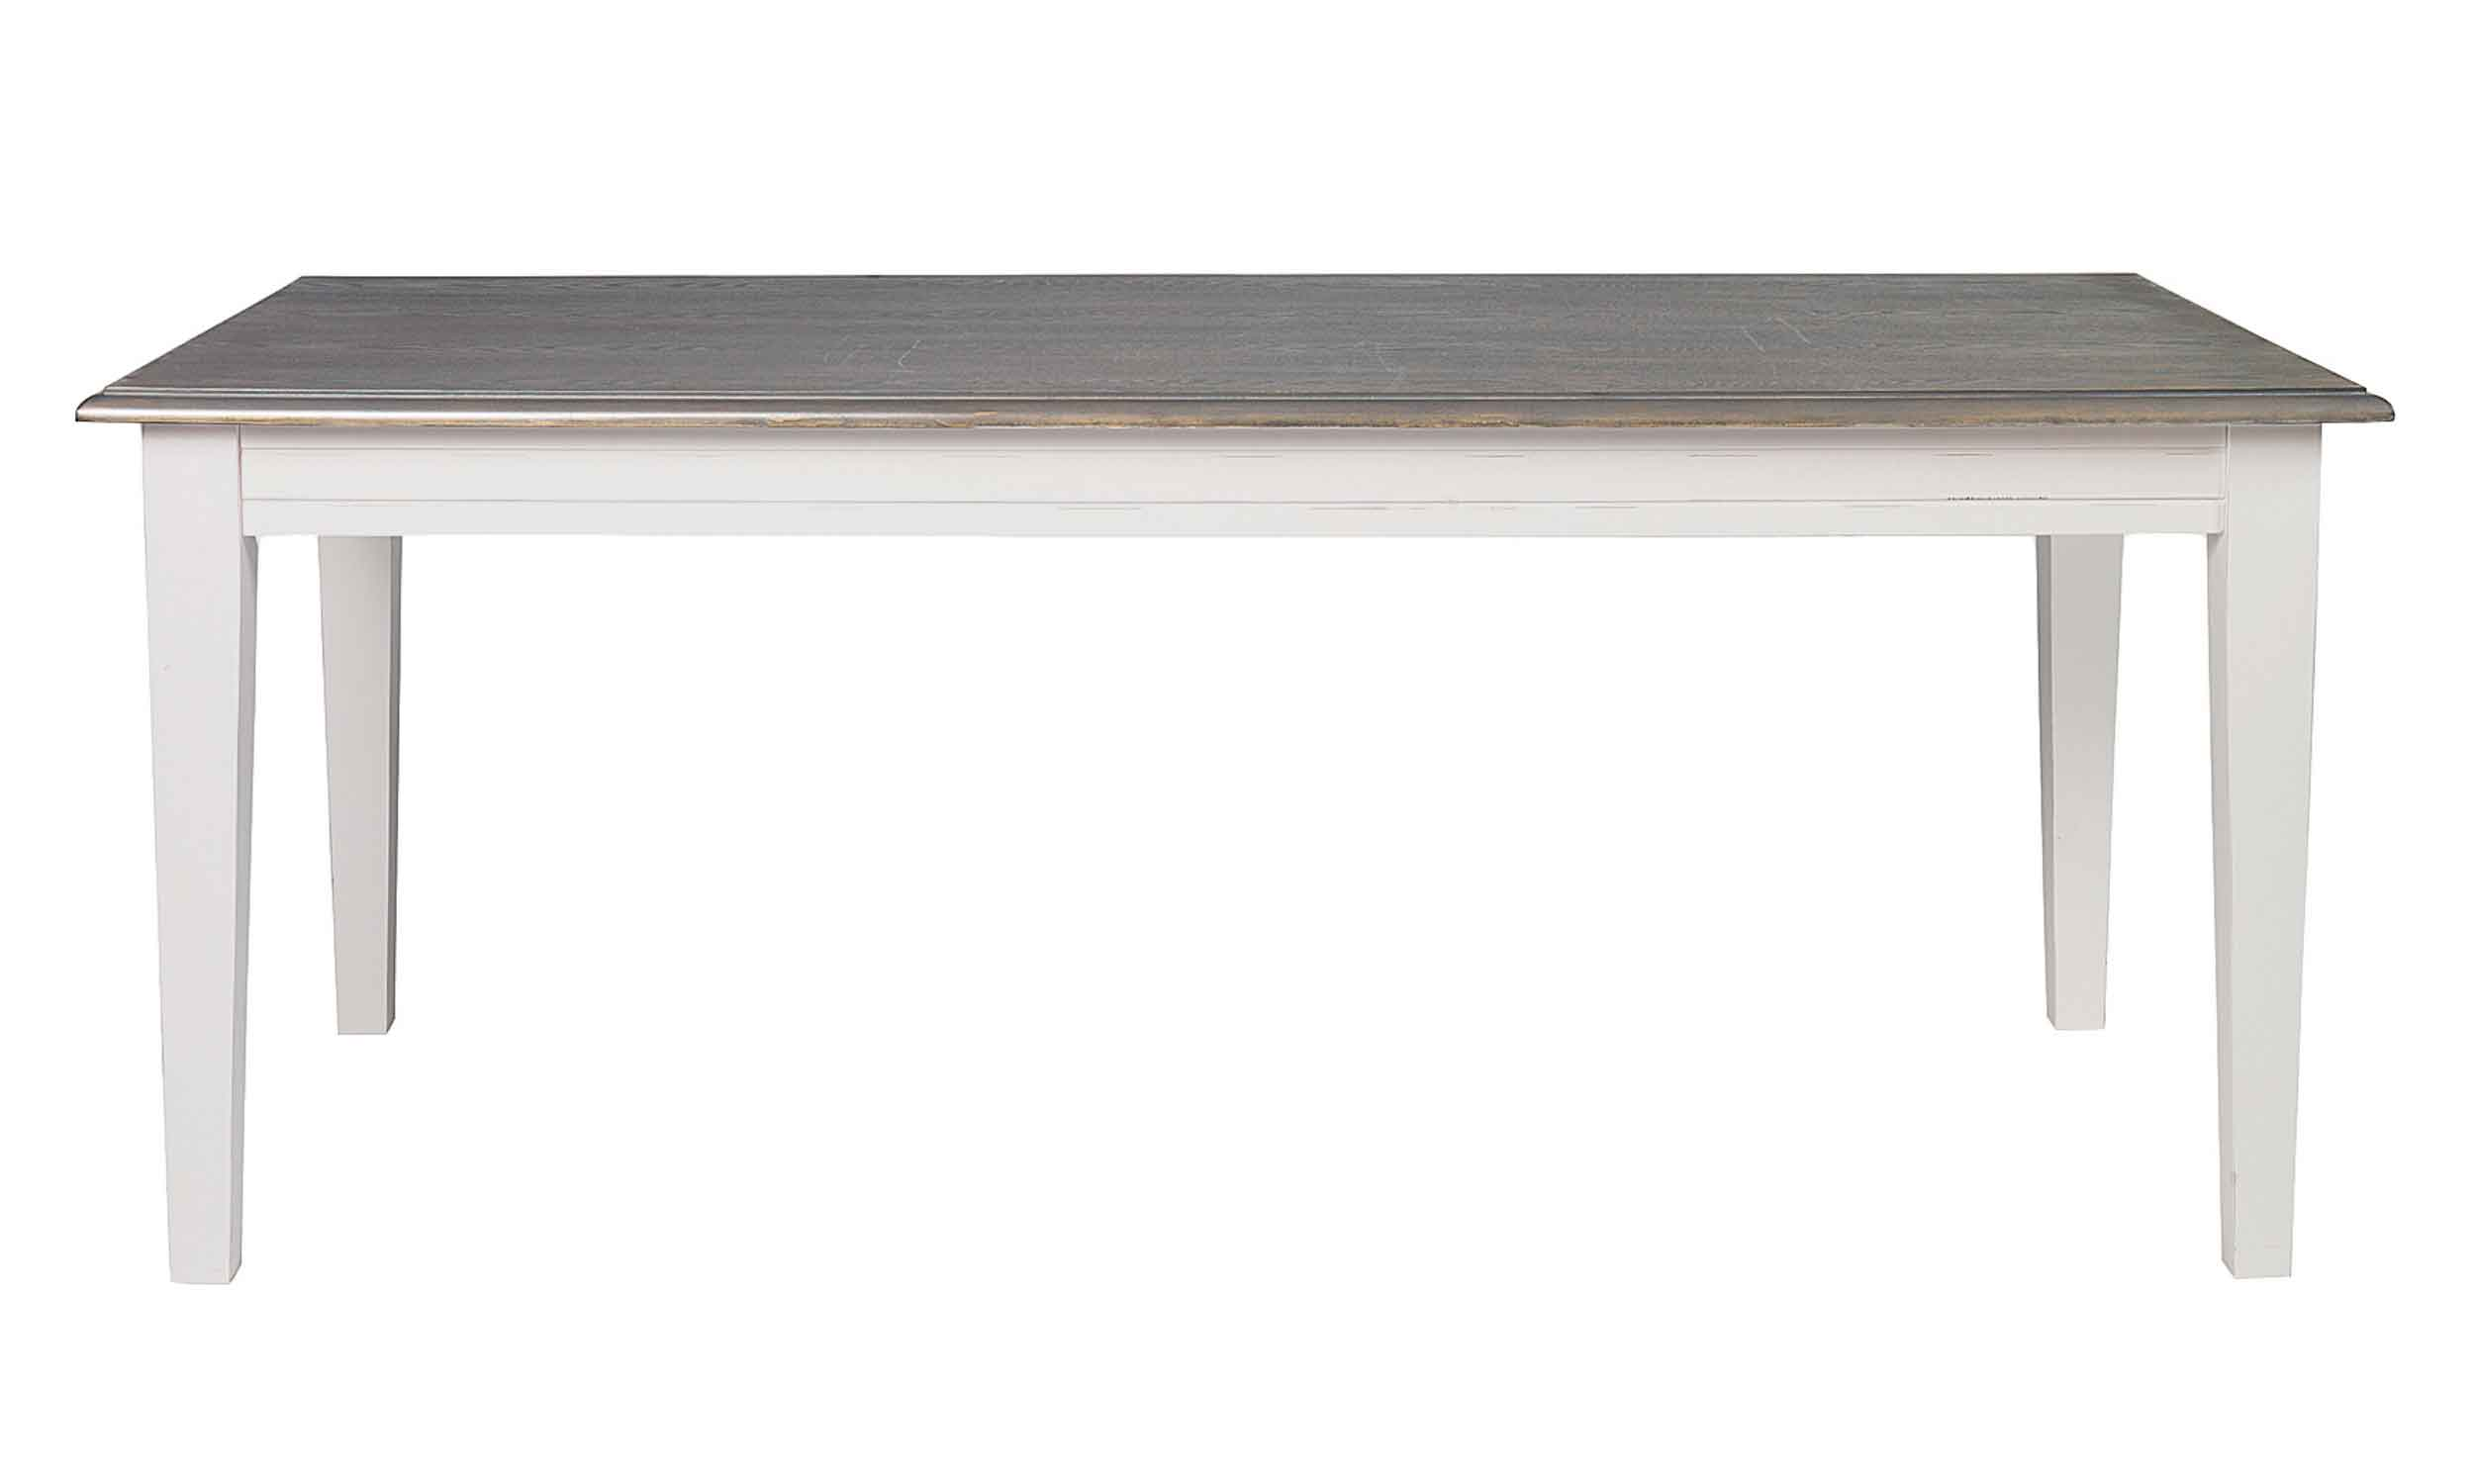 Viktoria spisebord - Grå bordplade, 190x95